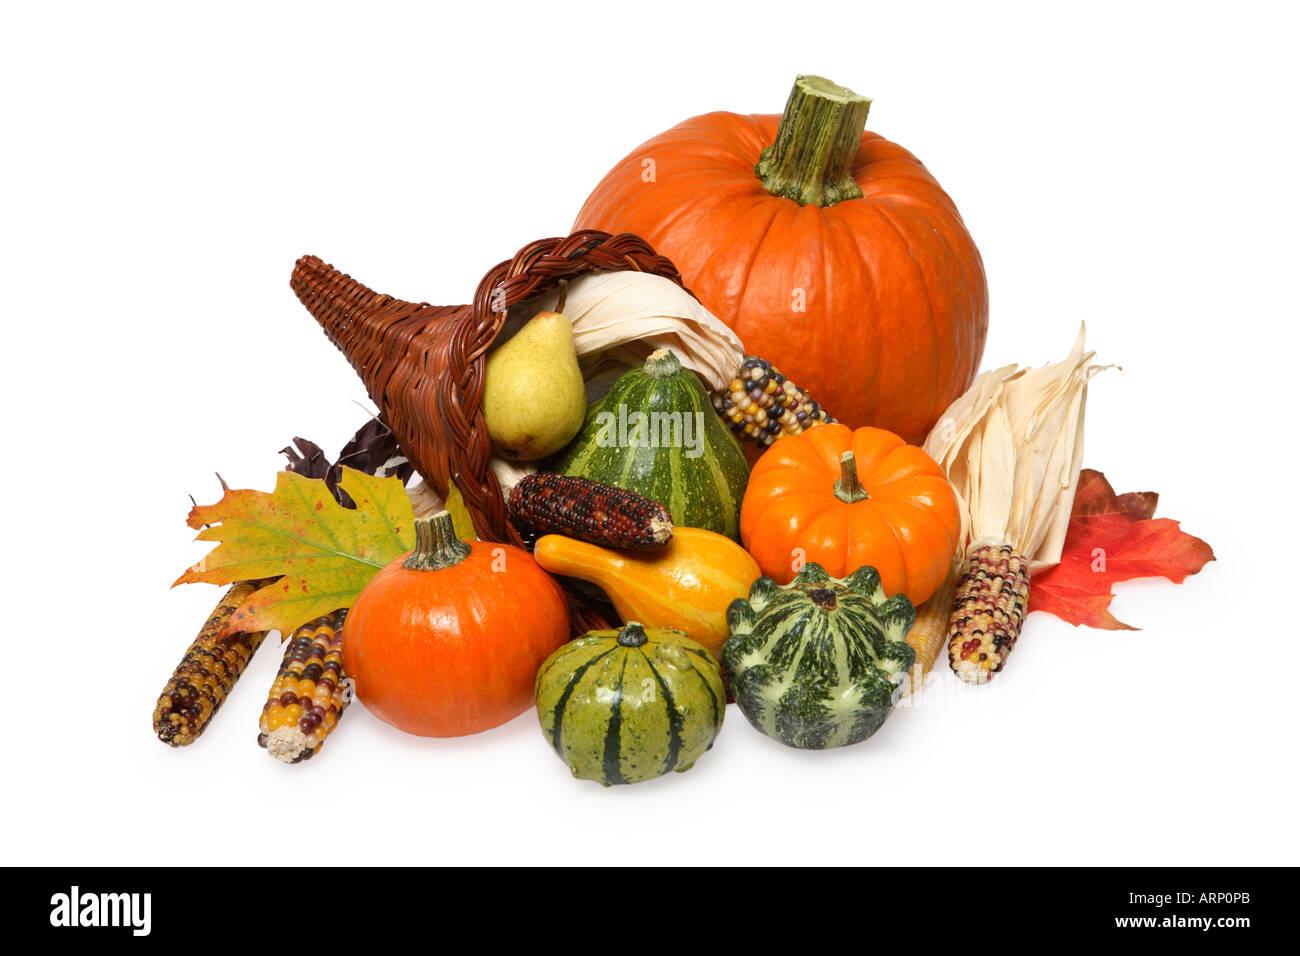 Cornucopia, Gourds and Pumpkin Seasonal Still Life - Stock Image